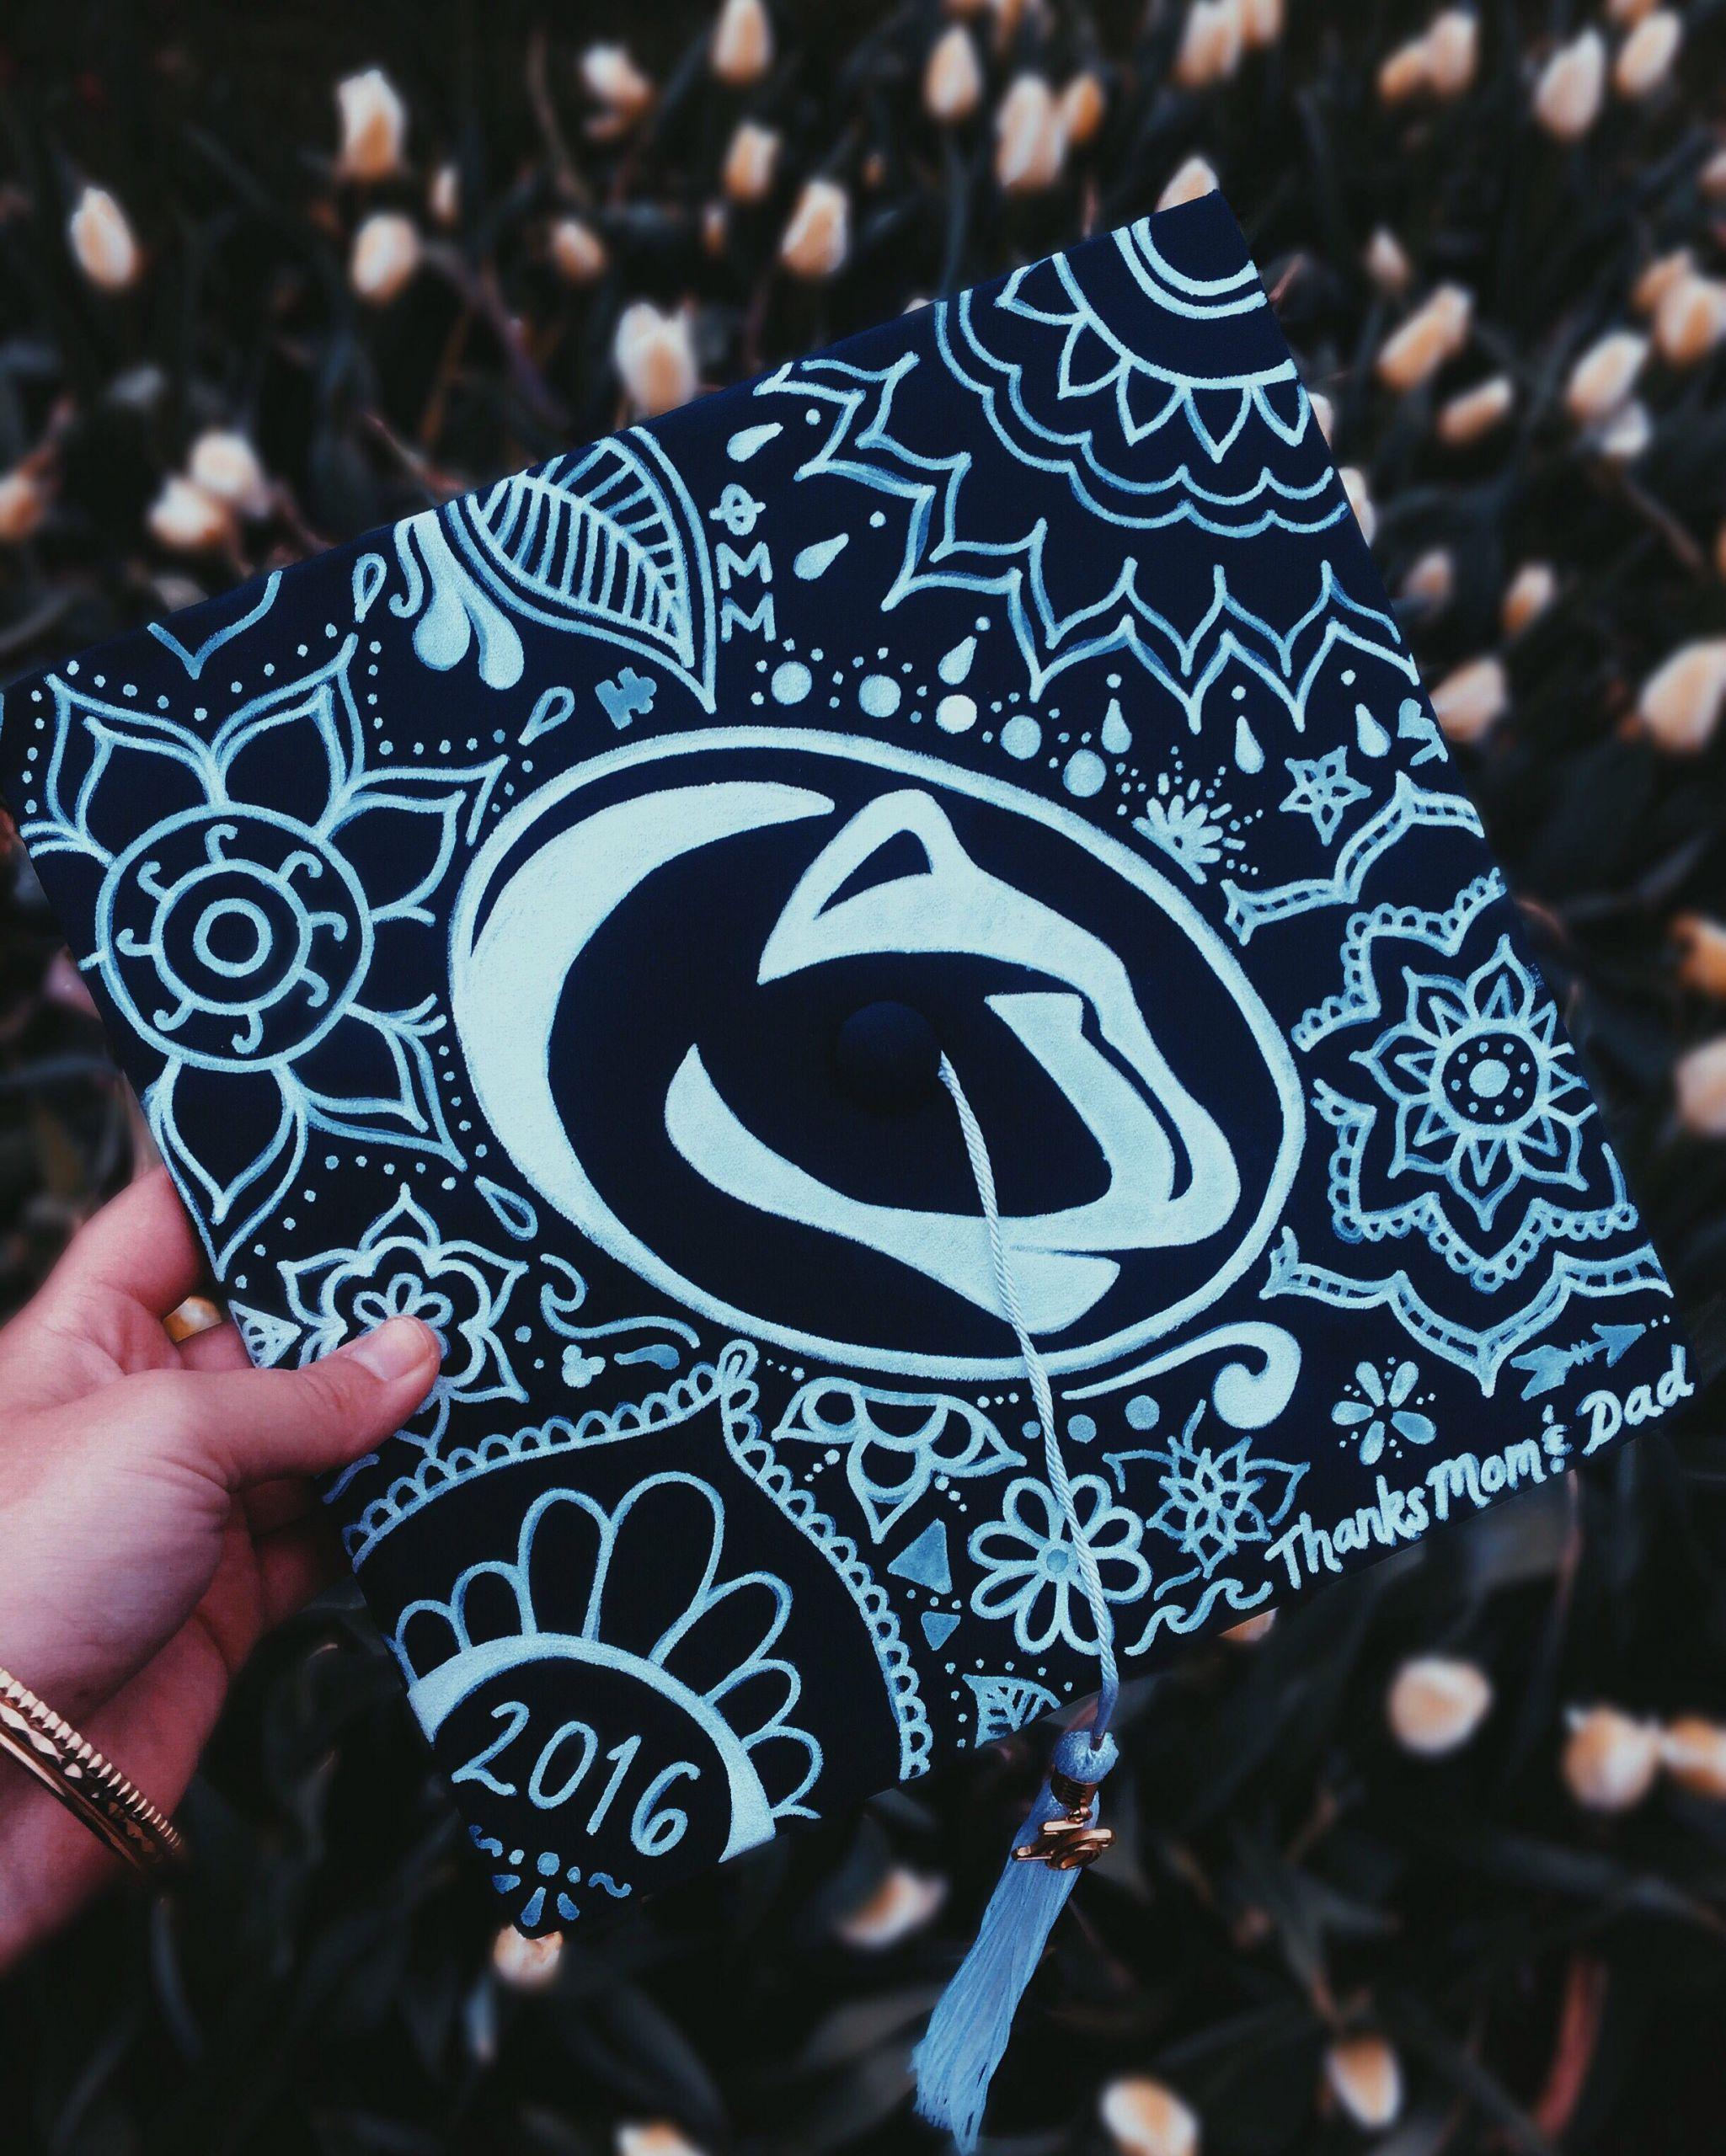 Penn State Graduation Gift Ideas  Penn State Graduation Cap DIY